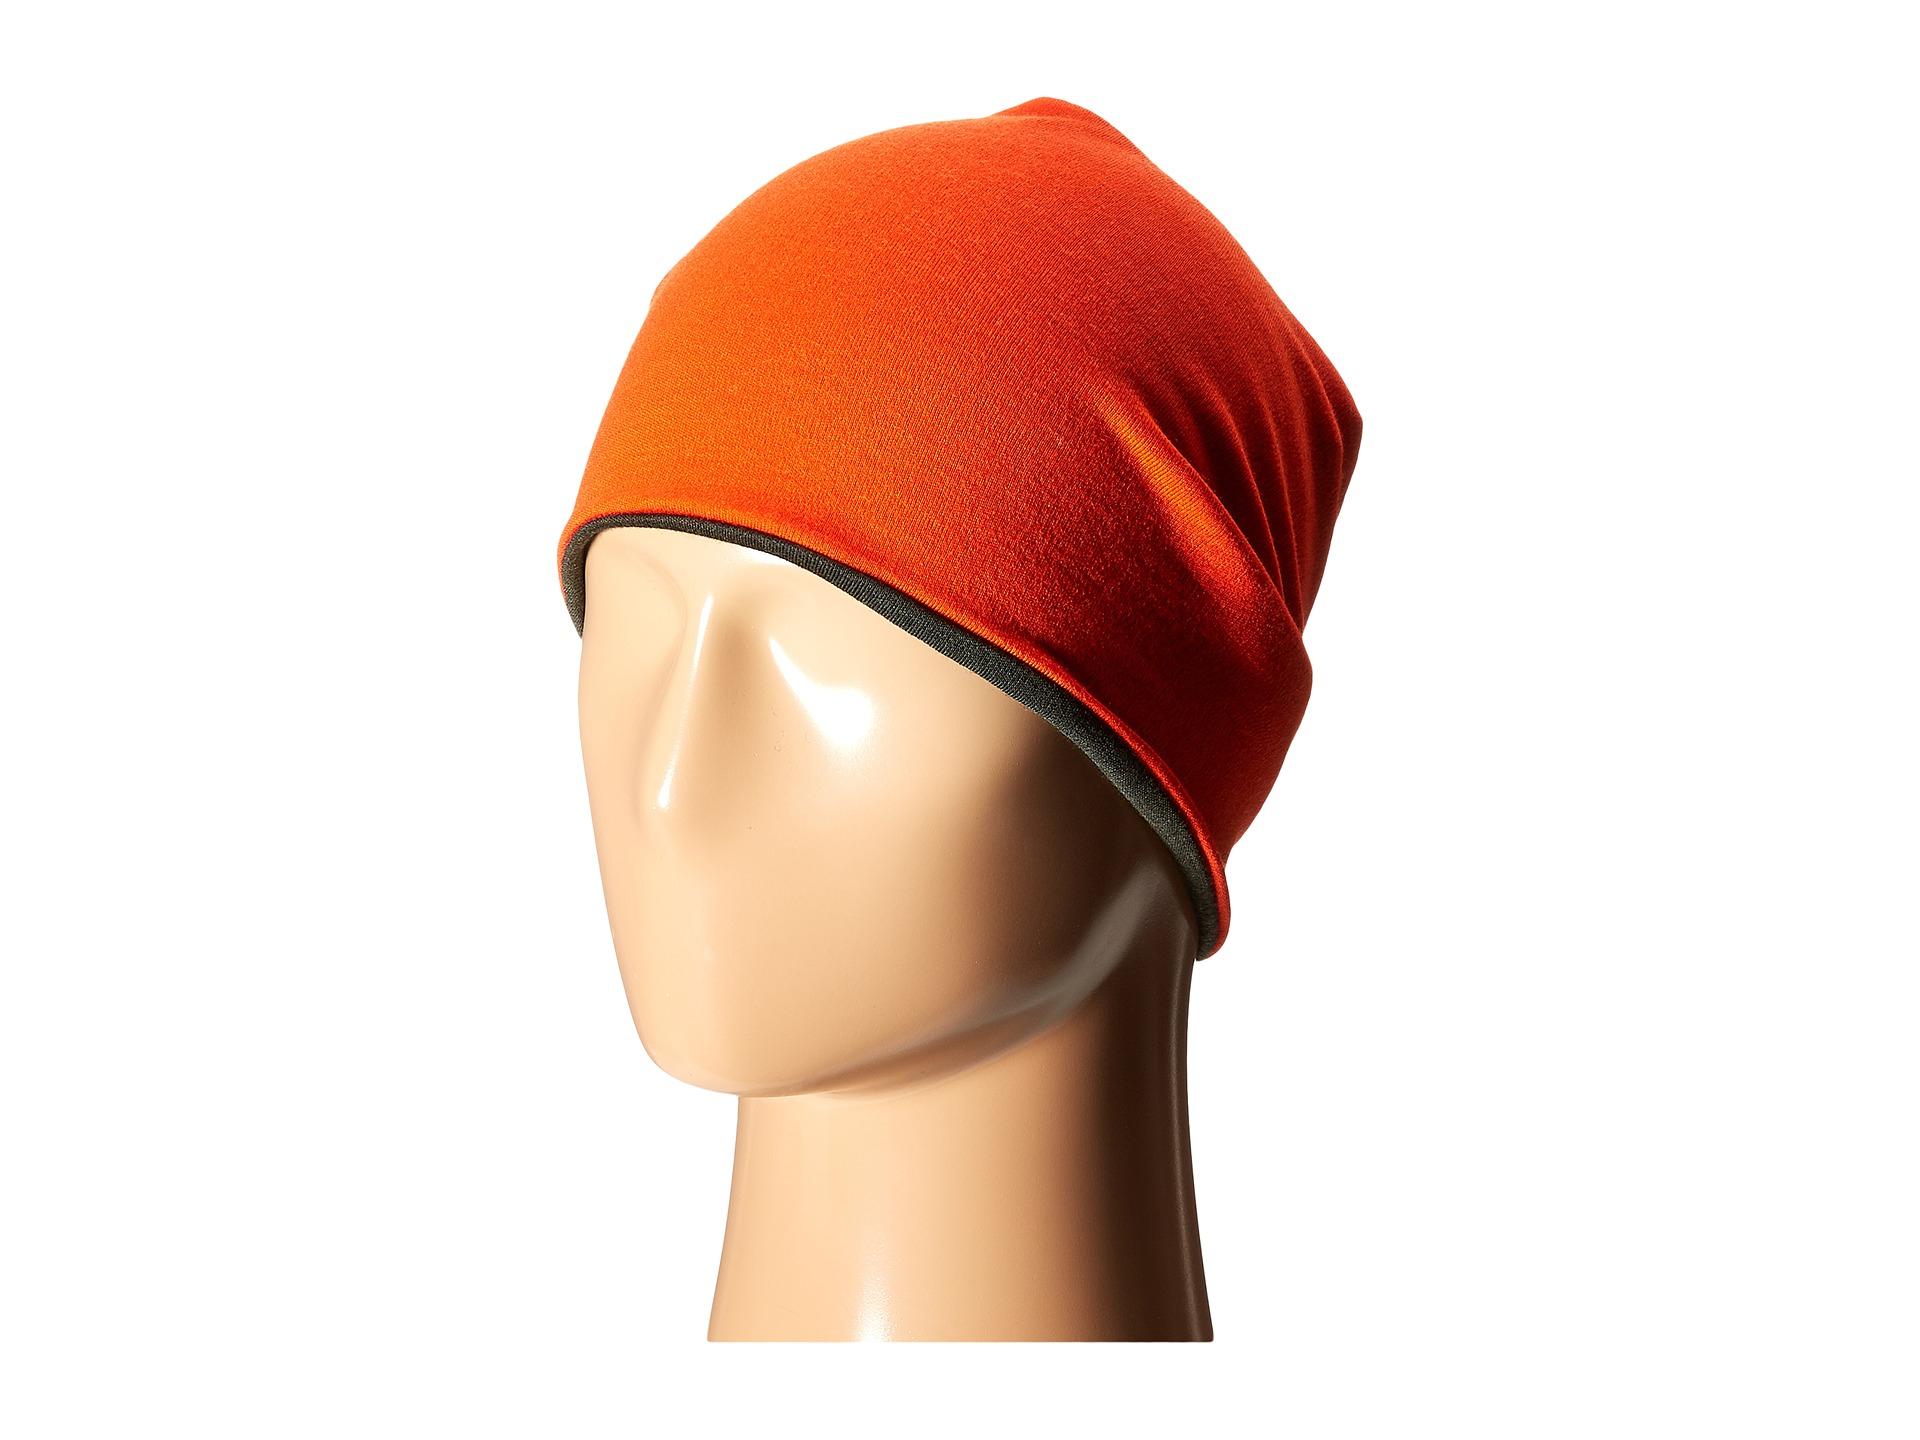 7ac2039d569 Smart Wool Hats - Hat HD Image Ukjugs.Org